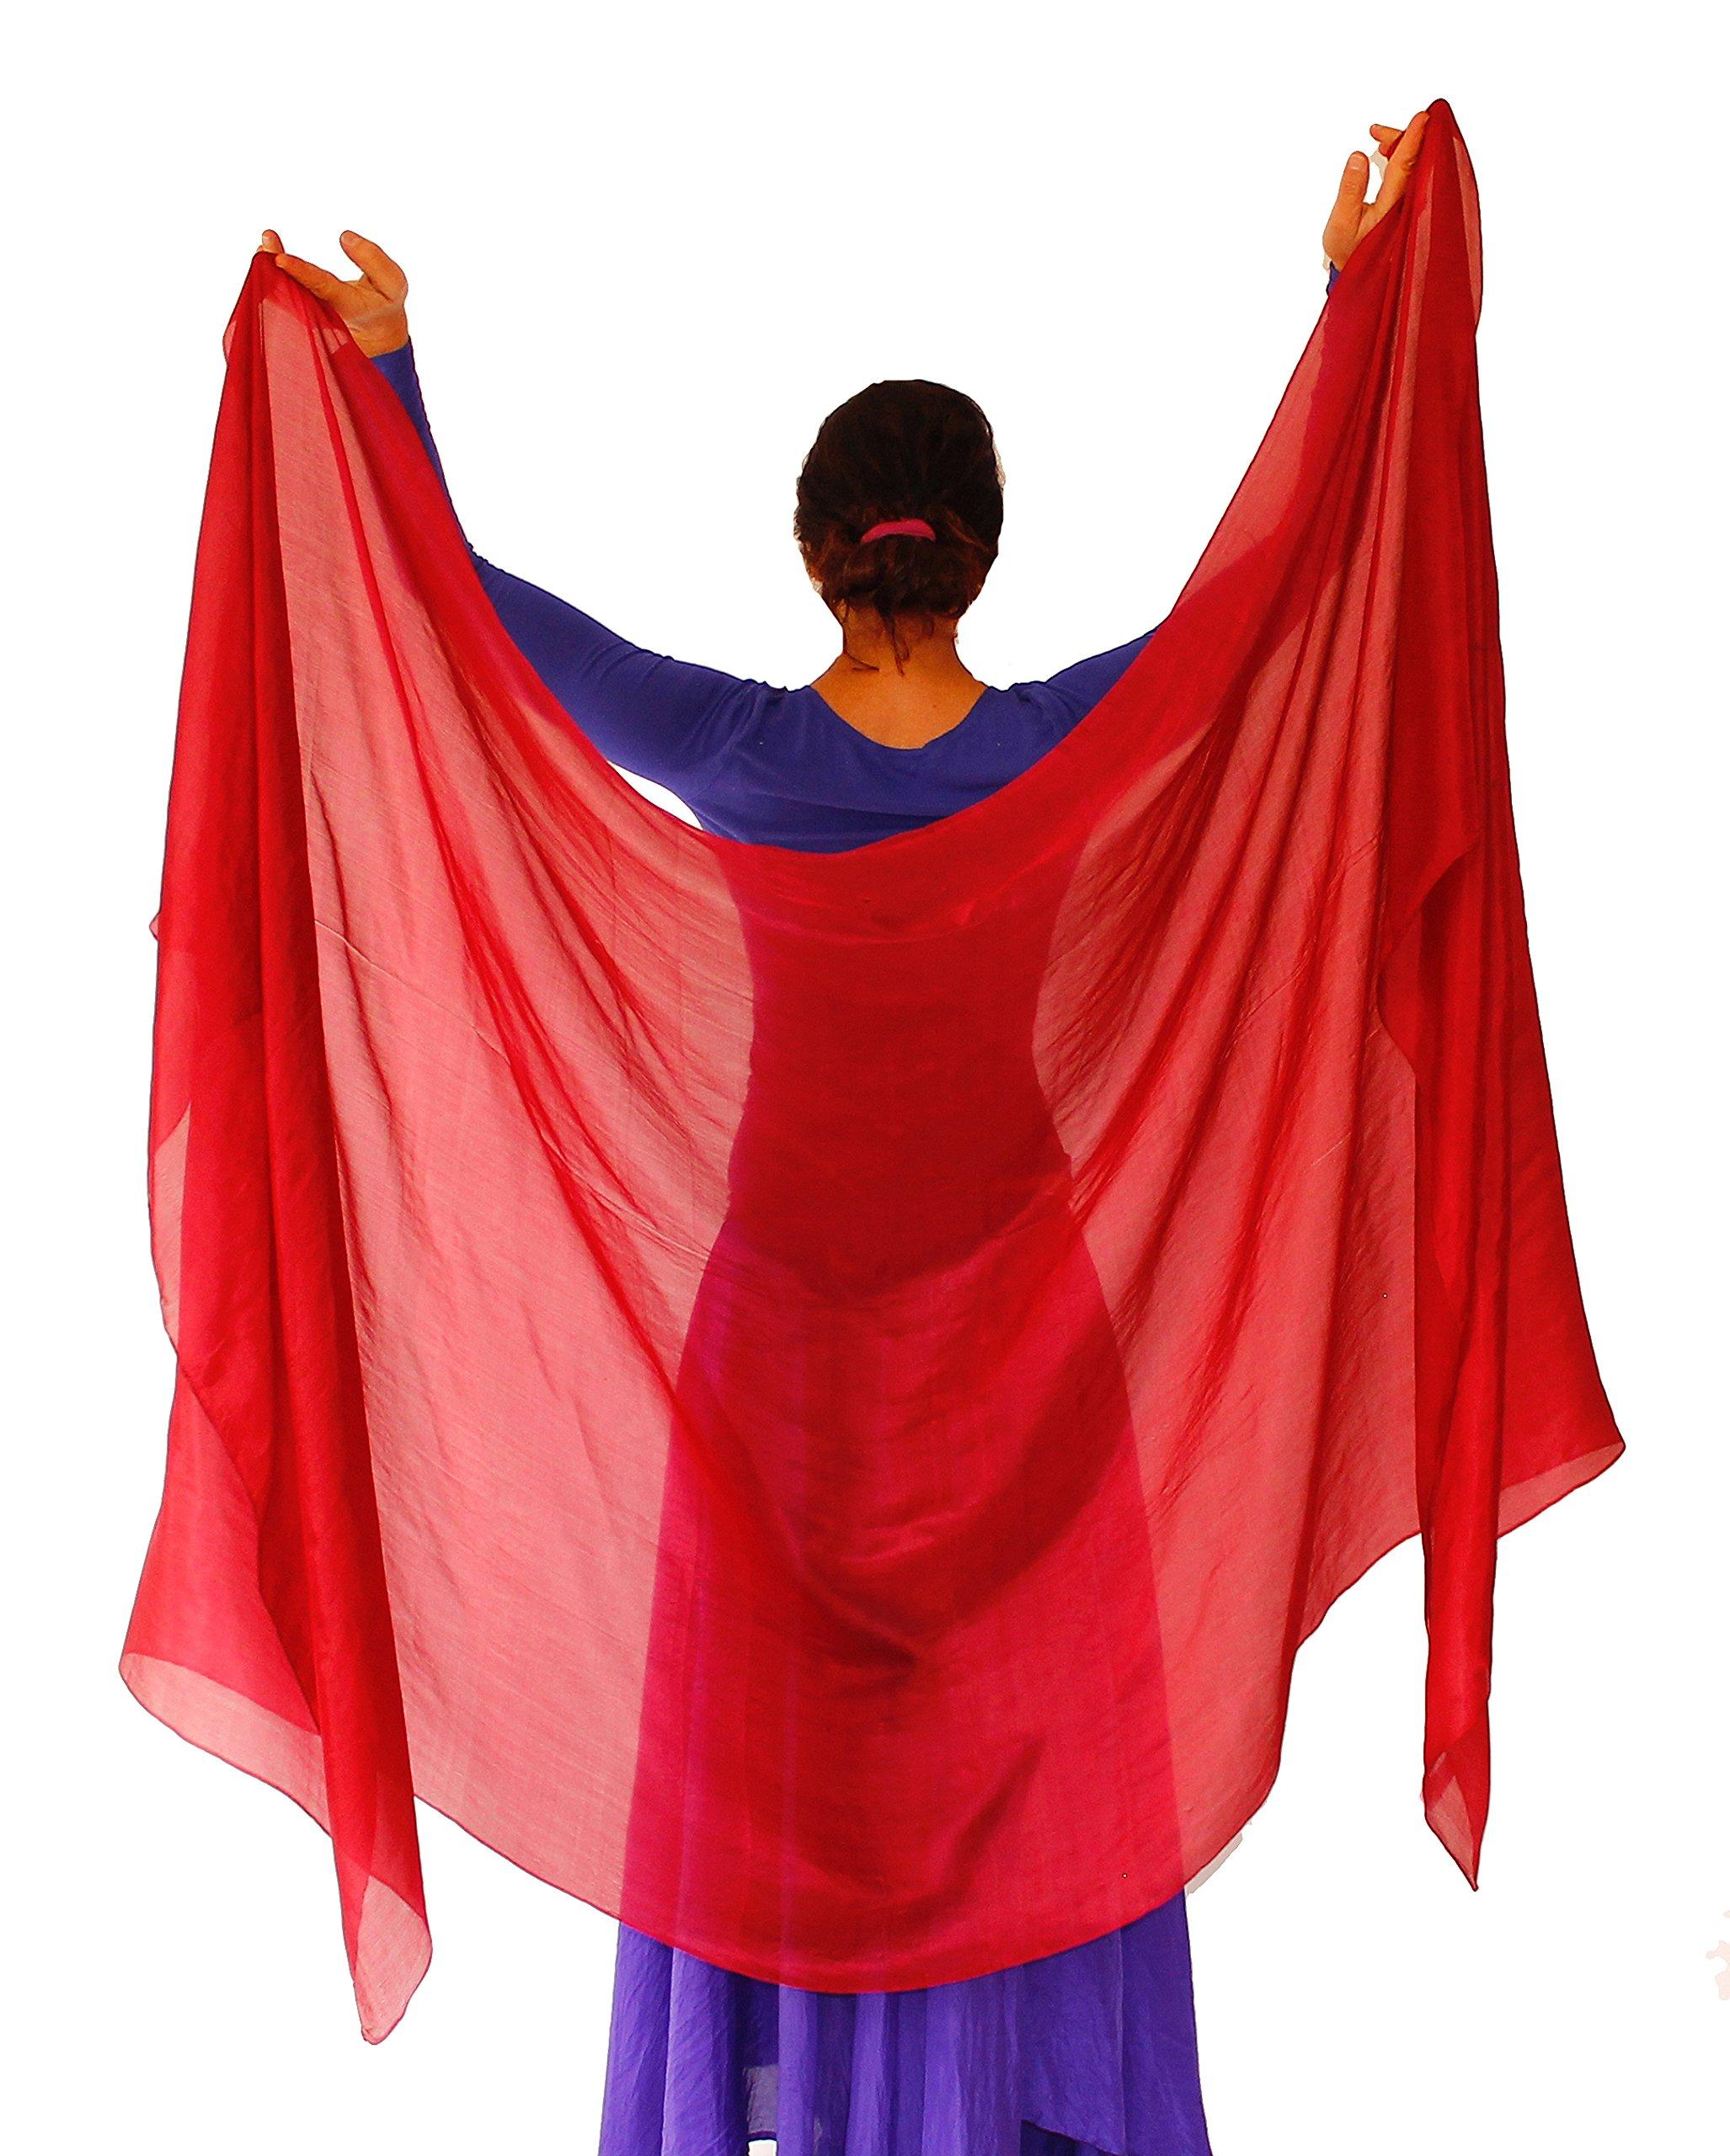 Nahari Silks Womens 100% Silk Dance Scarves Shawls Wraps Solid Colors Red 108'' by Nahari Silks